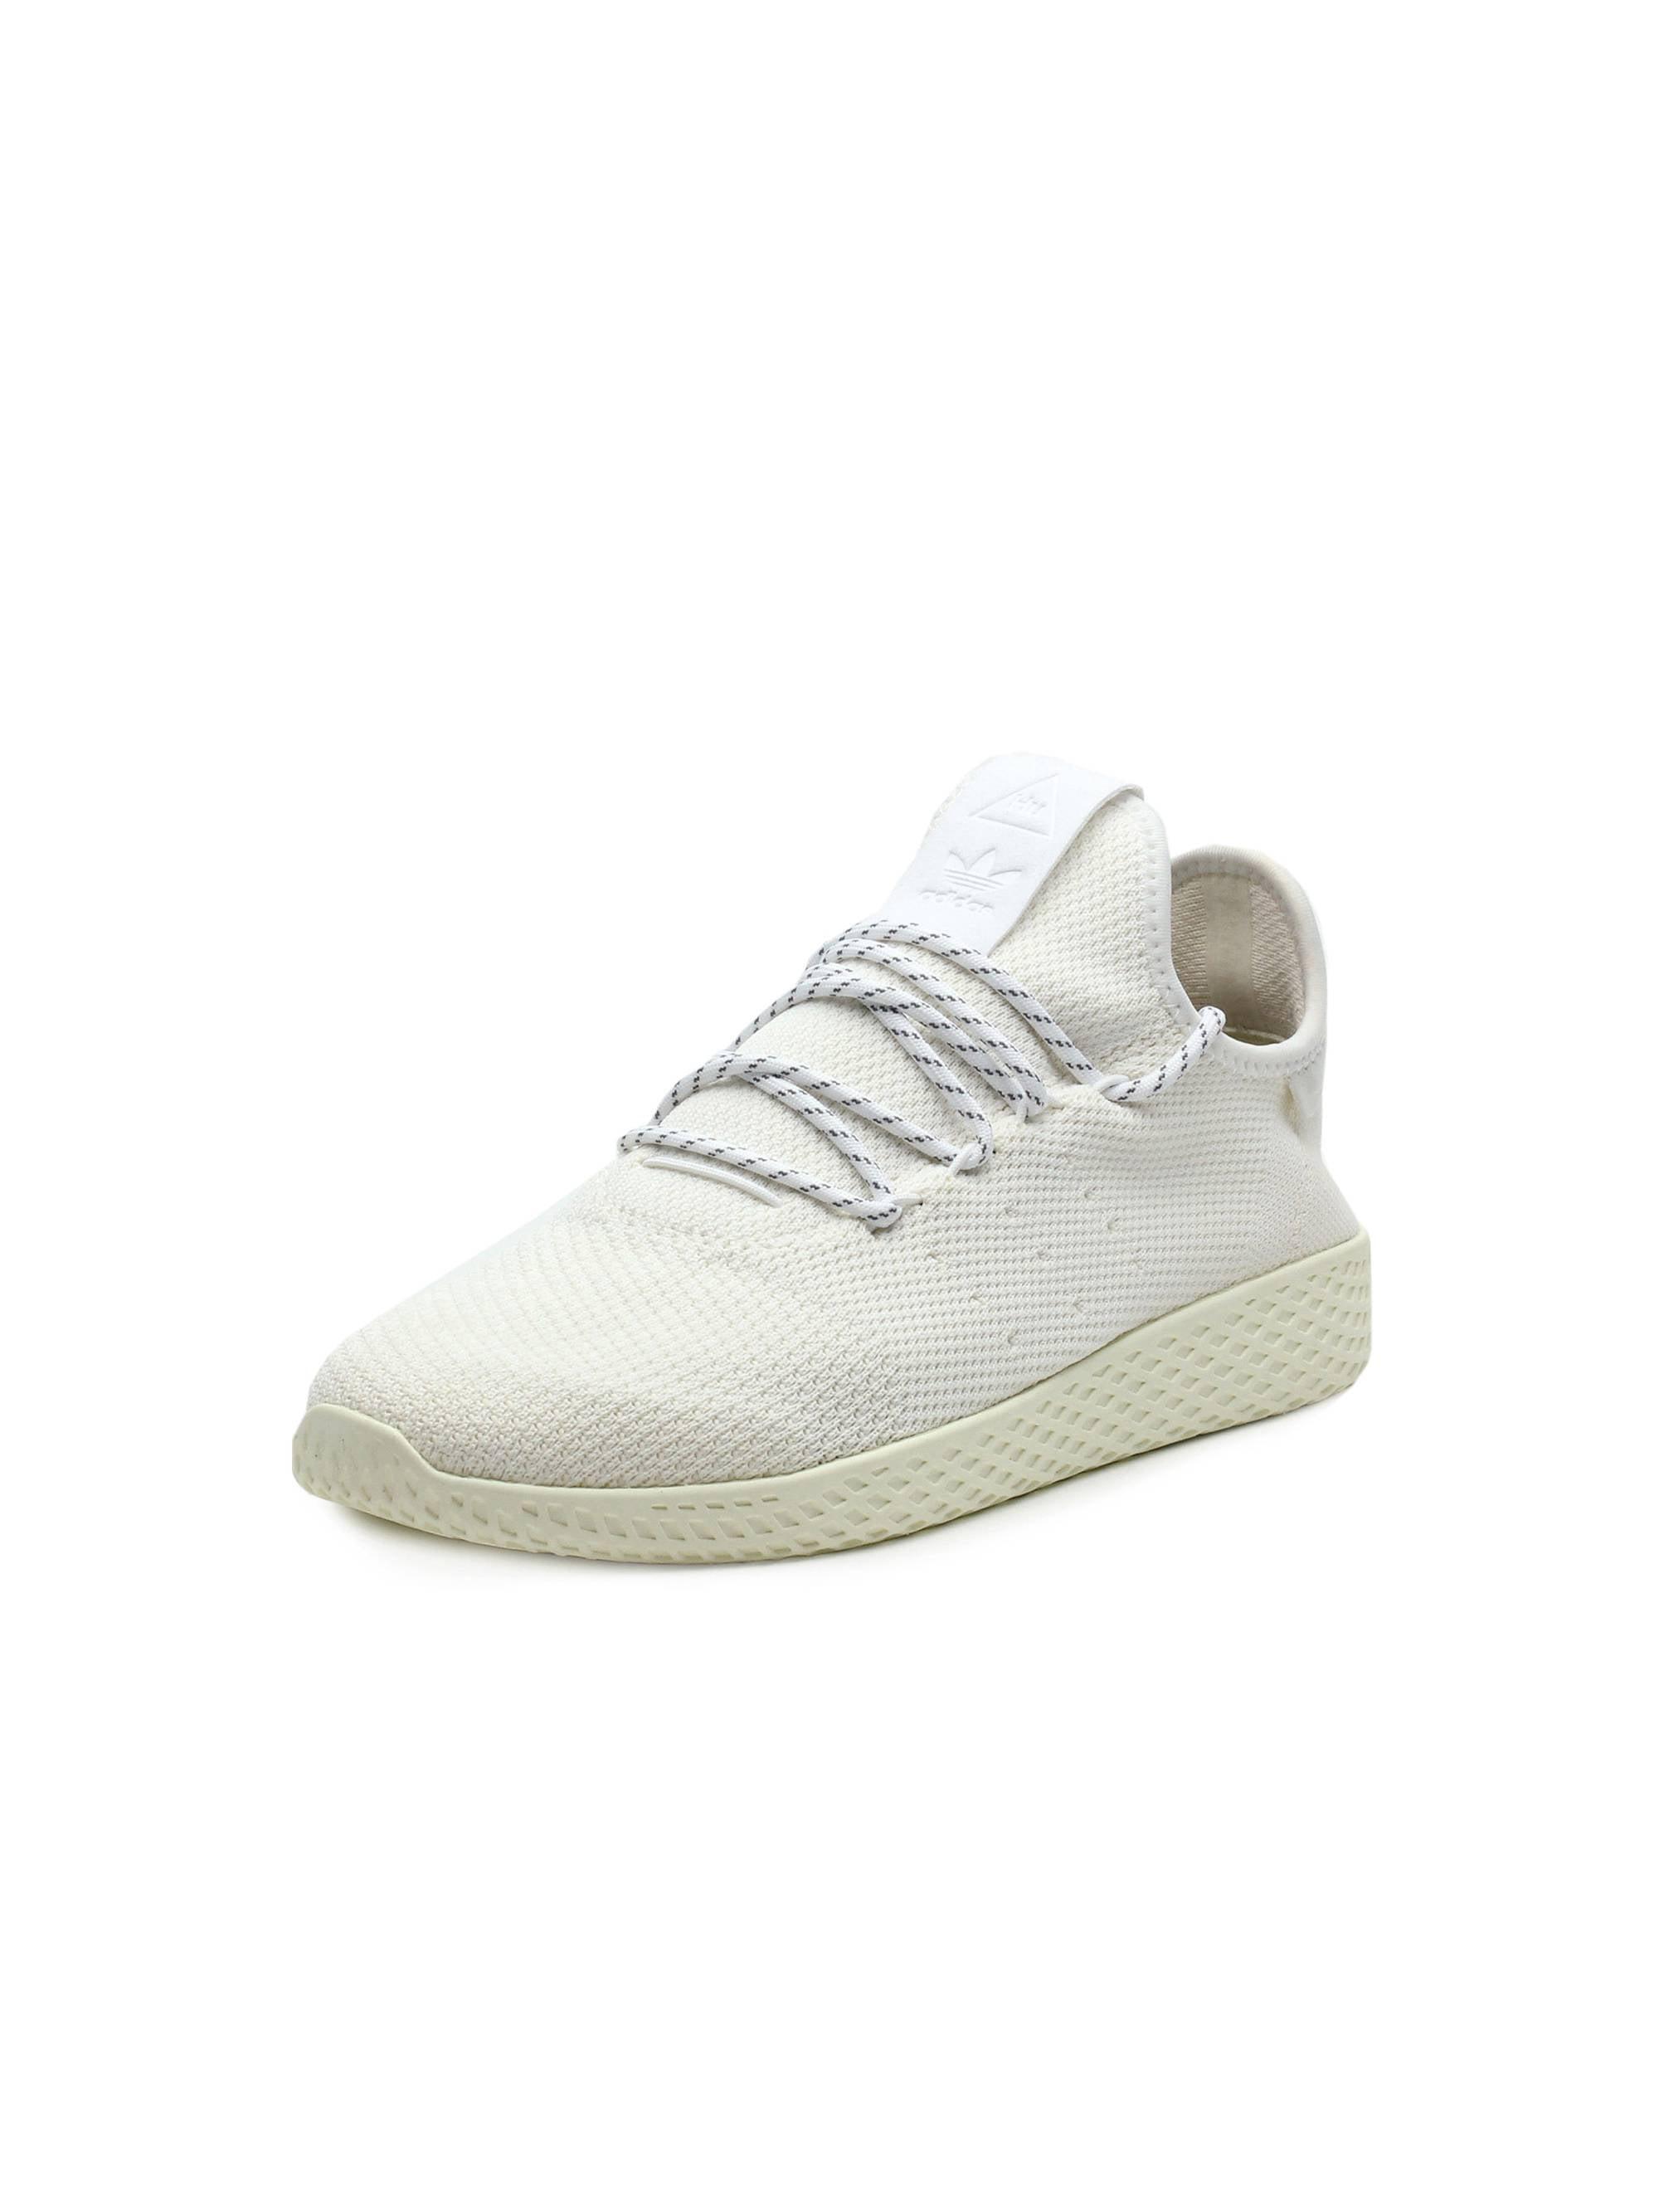 Adidas Mens PW HU Holi Tennis Hu BC White DA9613 by